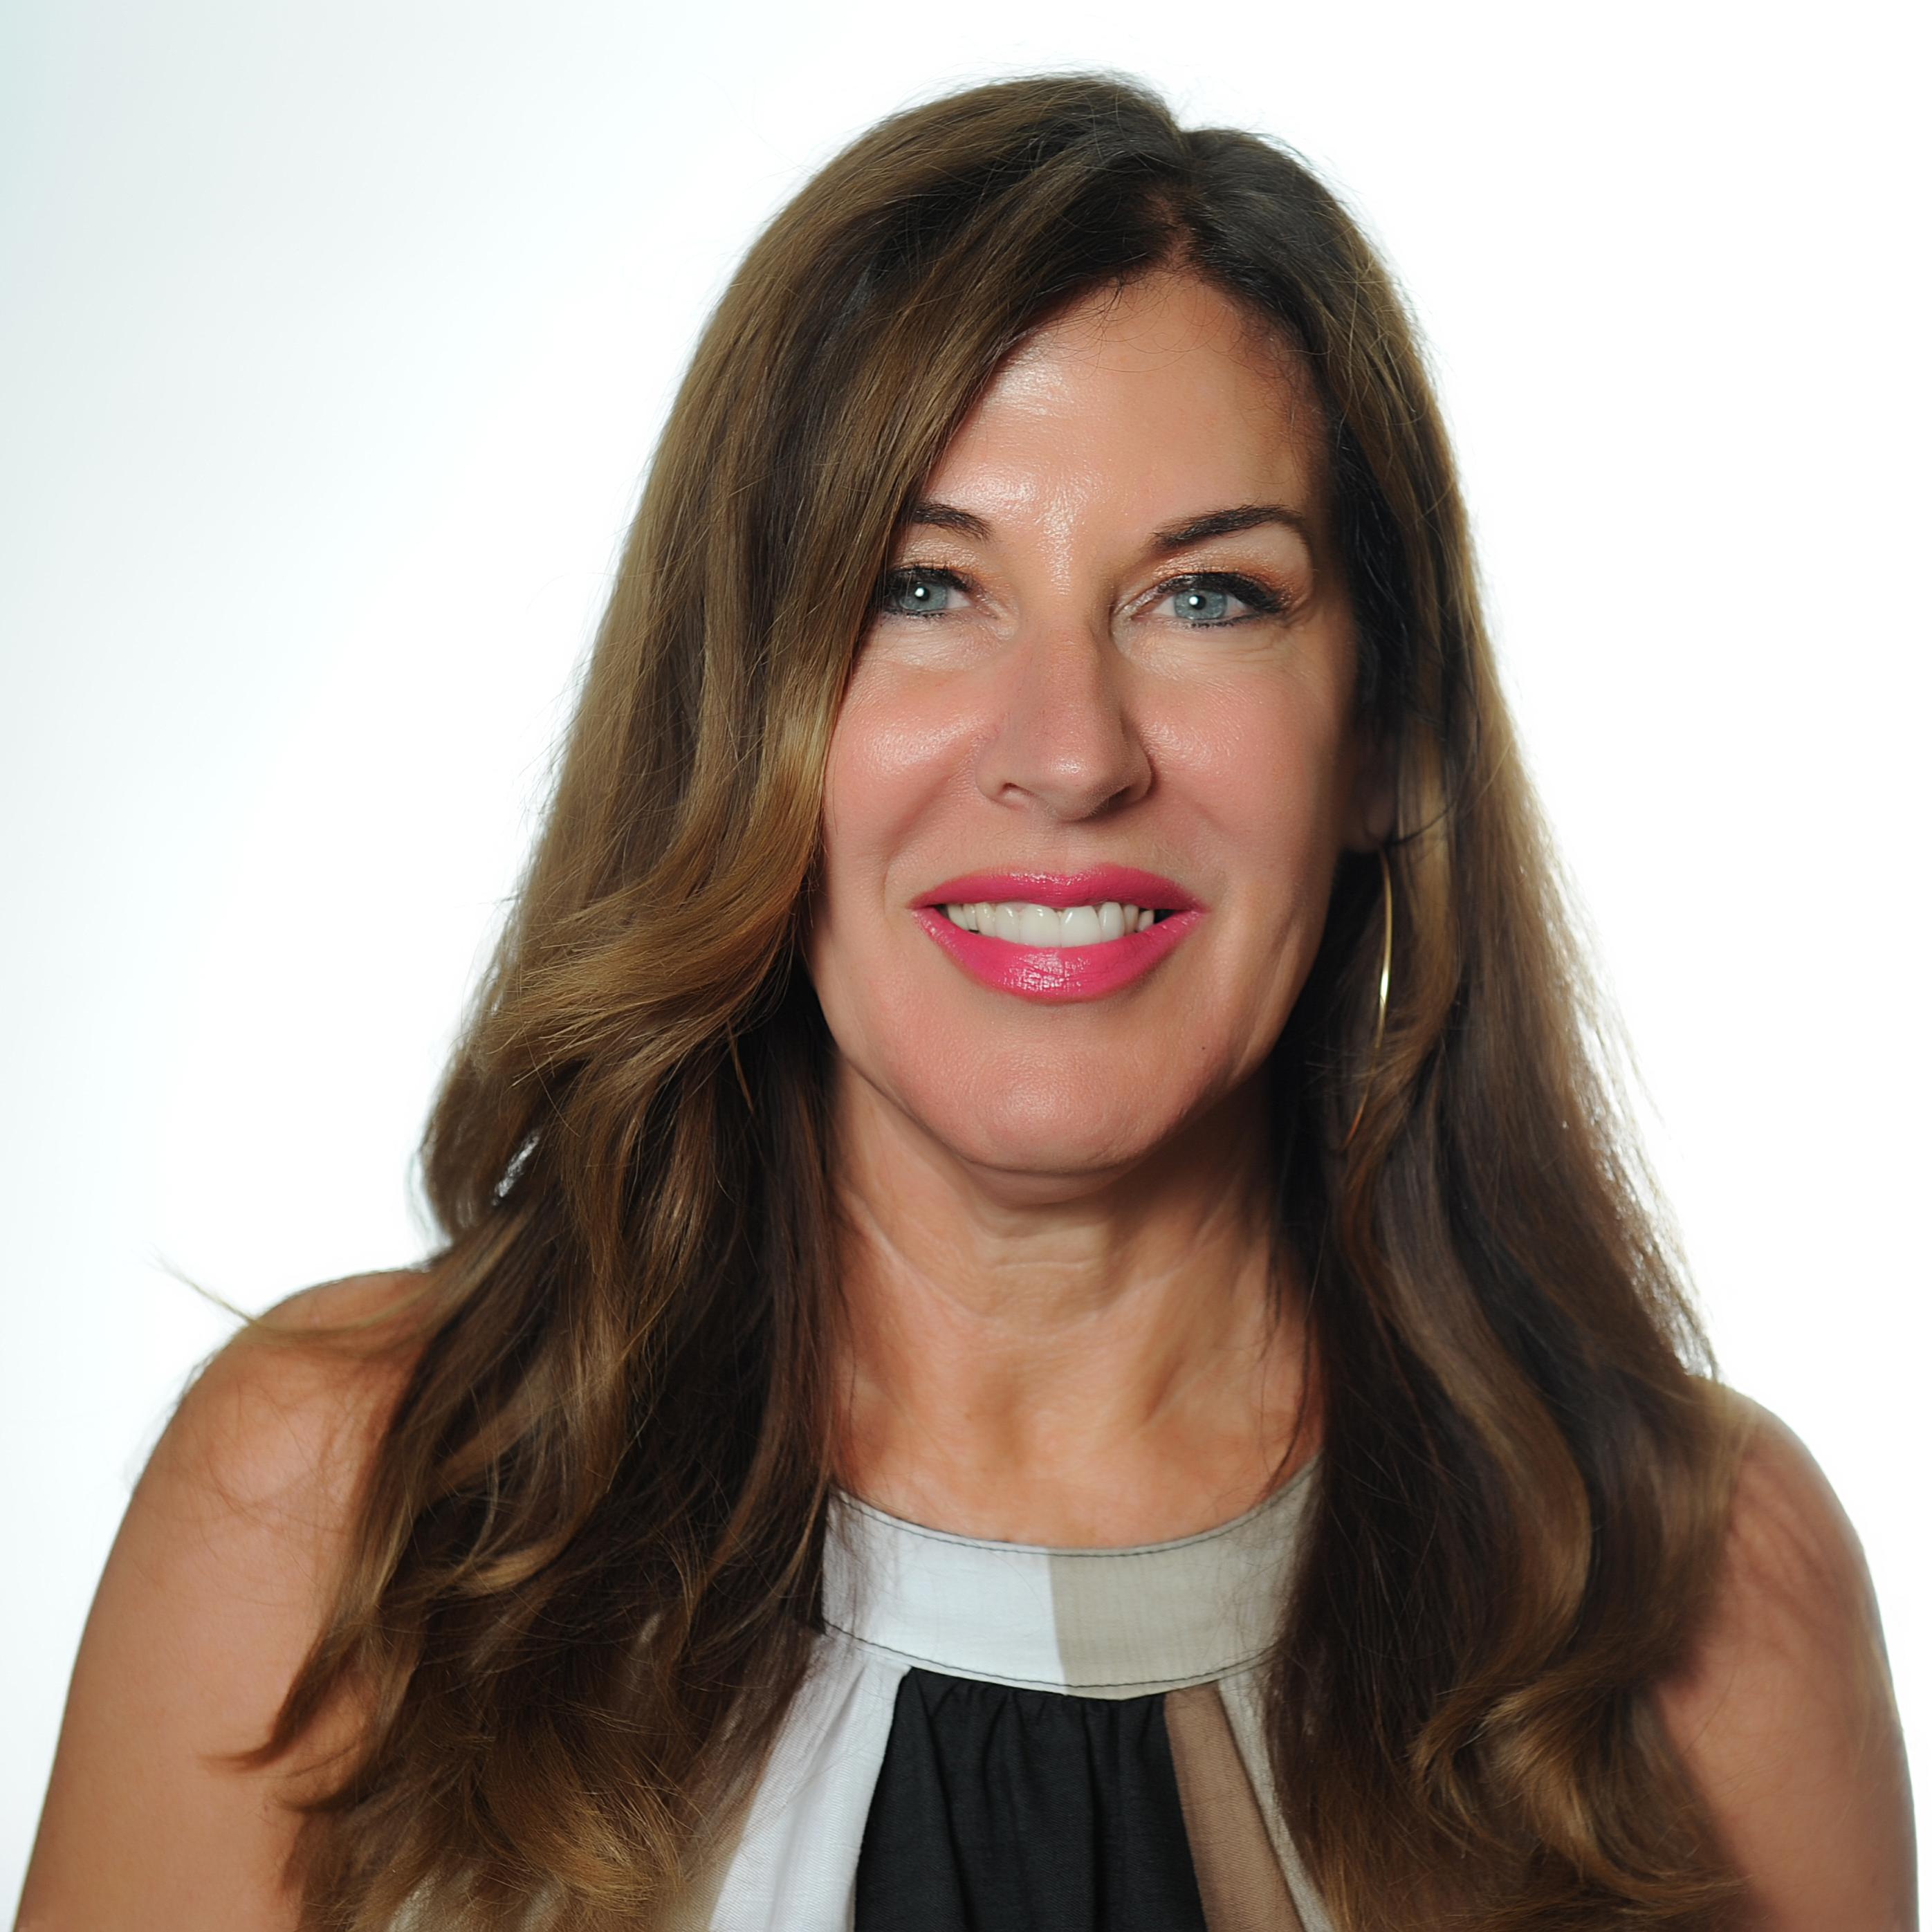 Laura DePasquale - Senior Vice President, Commercial Ops Artisanal Wine, Southern Glazer's Wine & Spirits, Master Sommelier